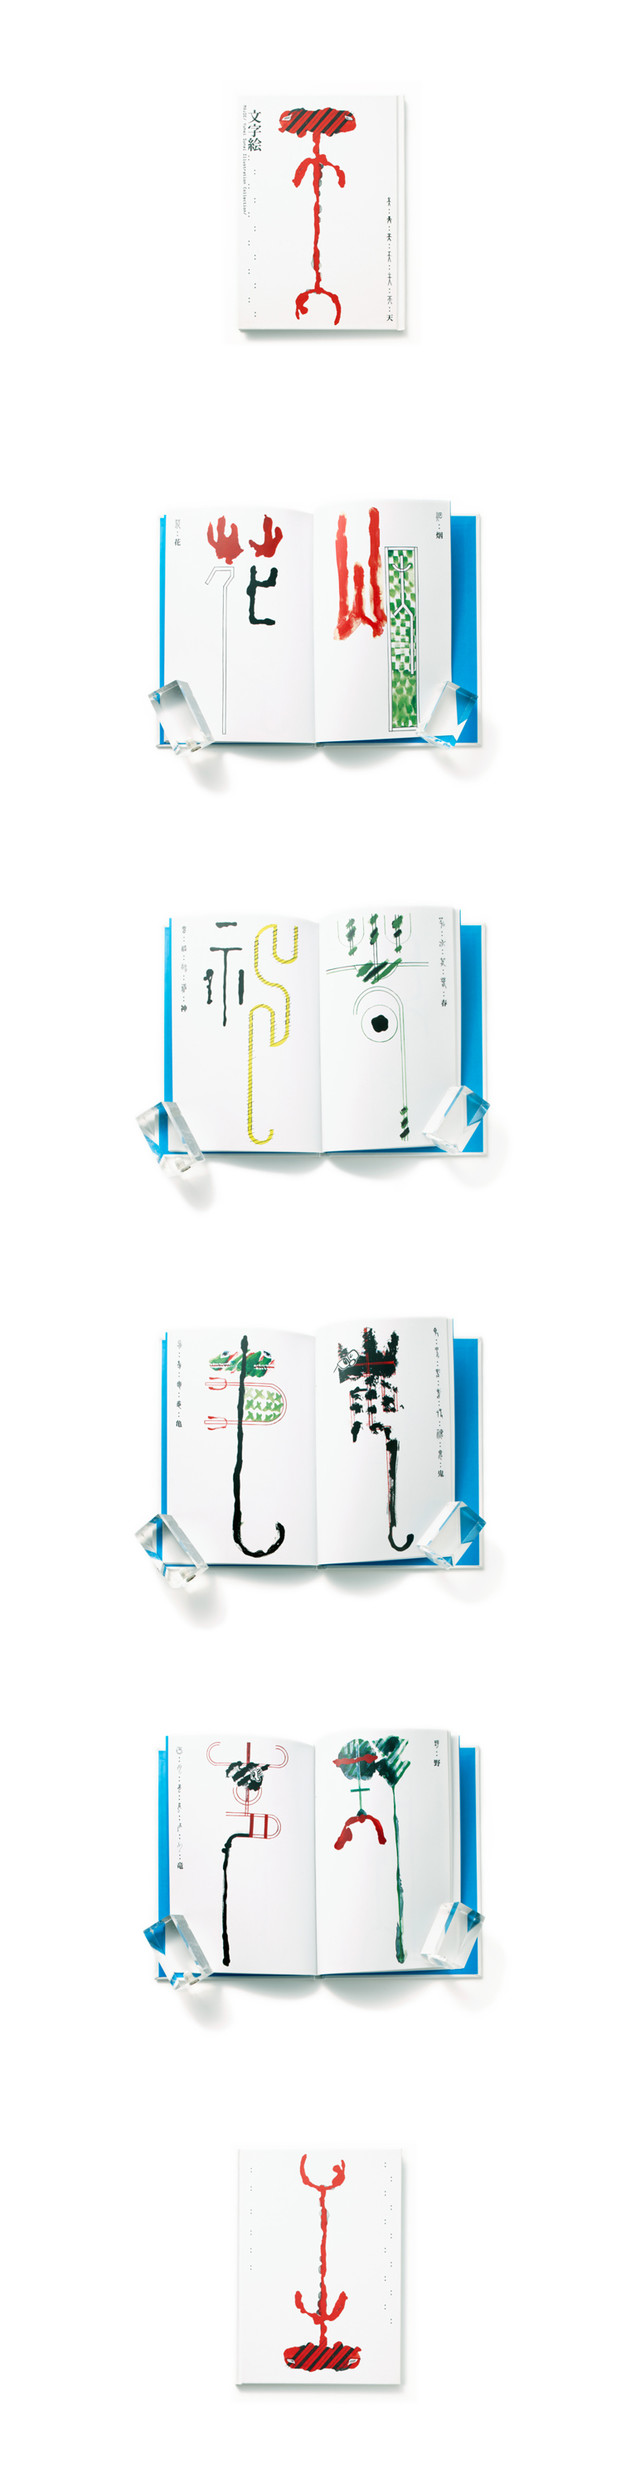 "Title: Anthology ""Mojie""(Private press edition)/ 作品集「文字絵」(私家版) Production year: 2008 Size: A5 Print: Digital print Photography: Ryohei Takanashi/ 高梨遼平  http://sunaiyuhei.tumblr.com"